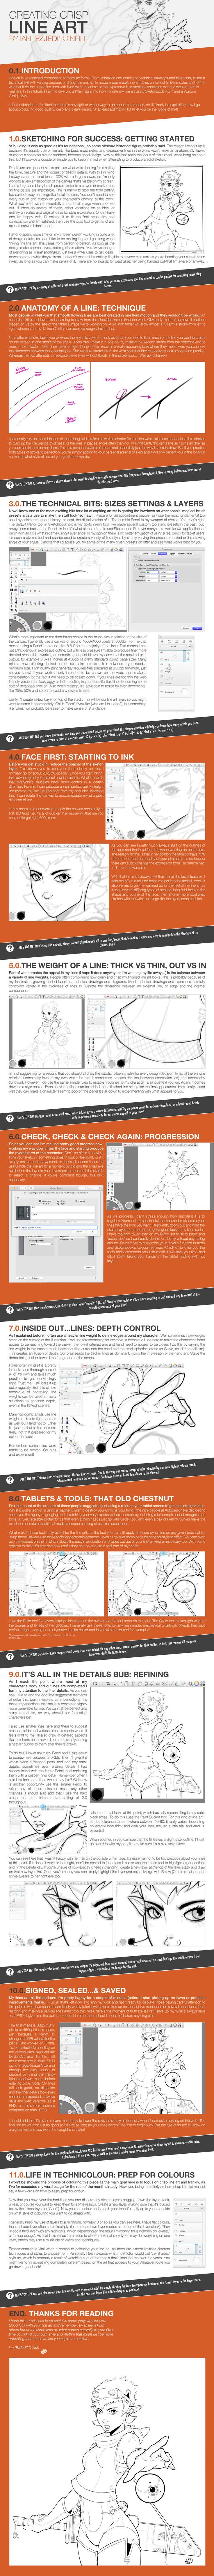 Tutorial: Creating Crisp Line Art by EzJedi.deviantart.com on @DeviantArt